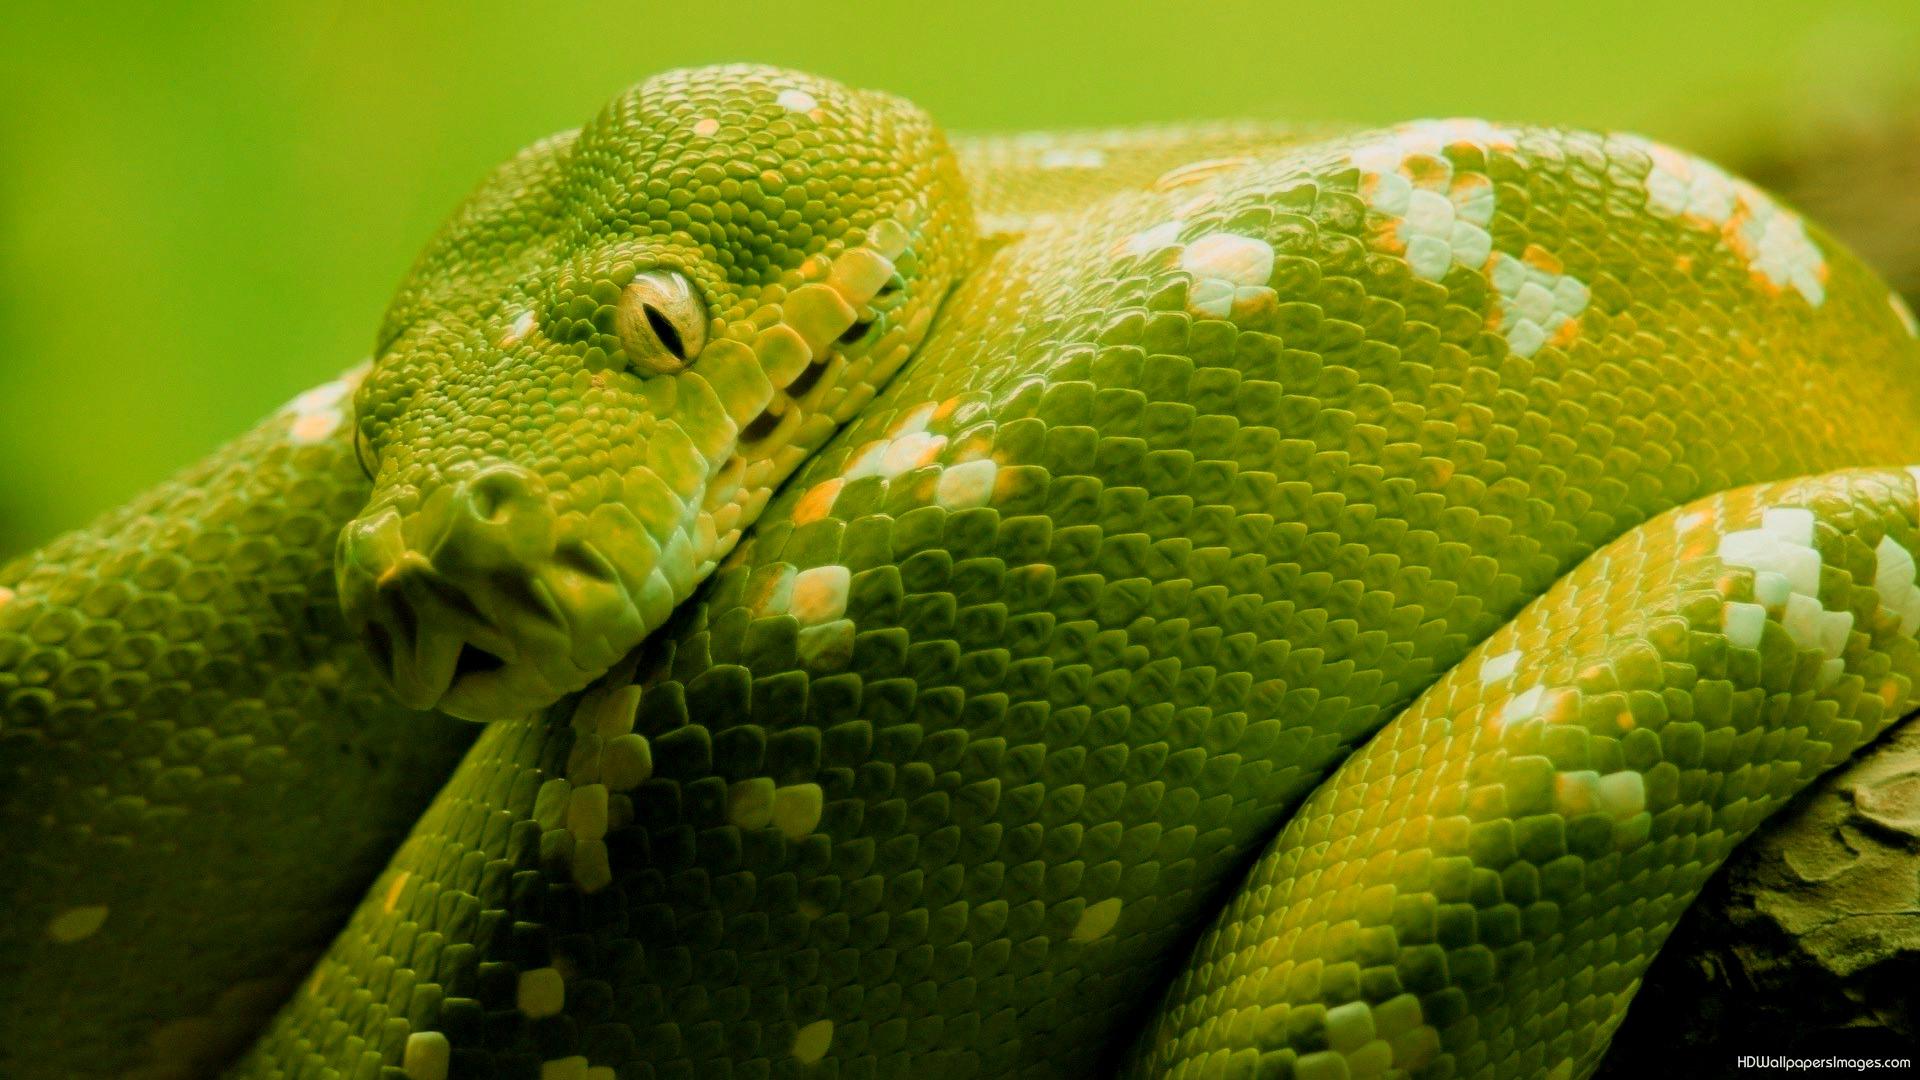 Hd Wallpaper Of Black Snake: Green And Black Snake 59 Desktop Background